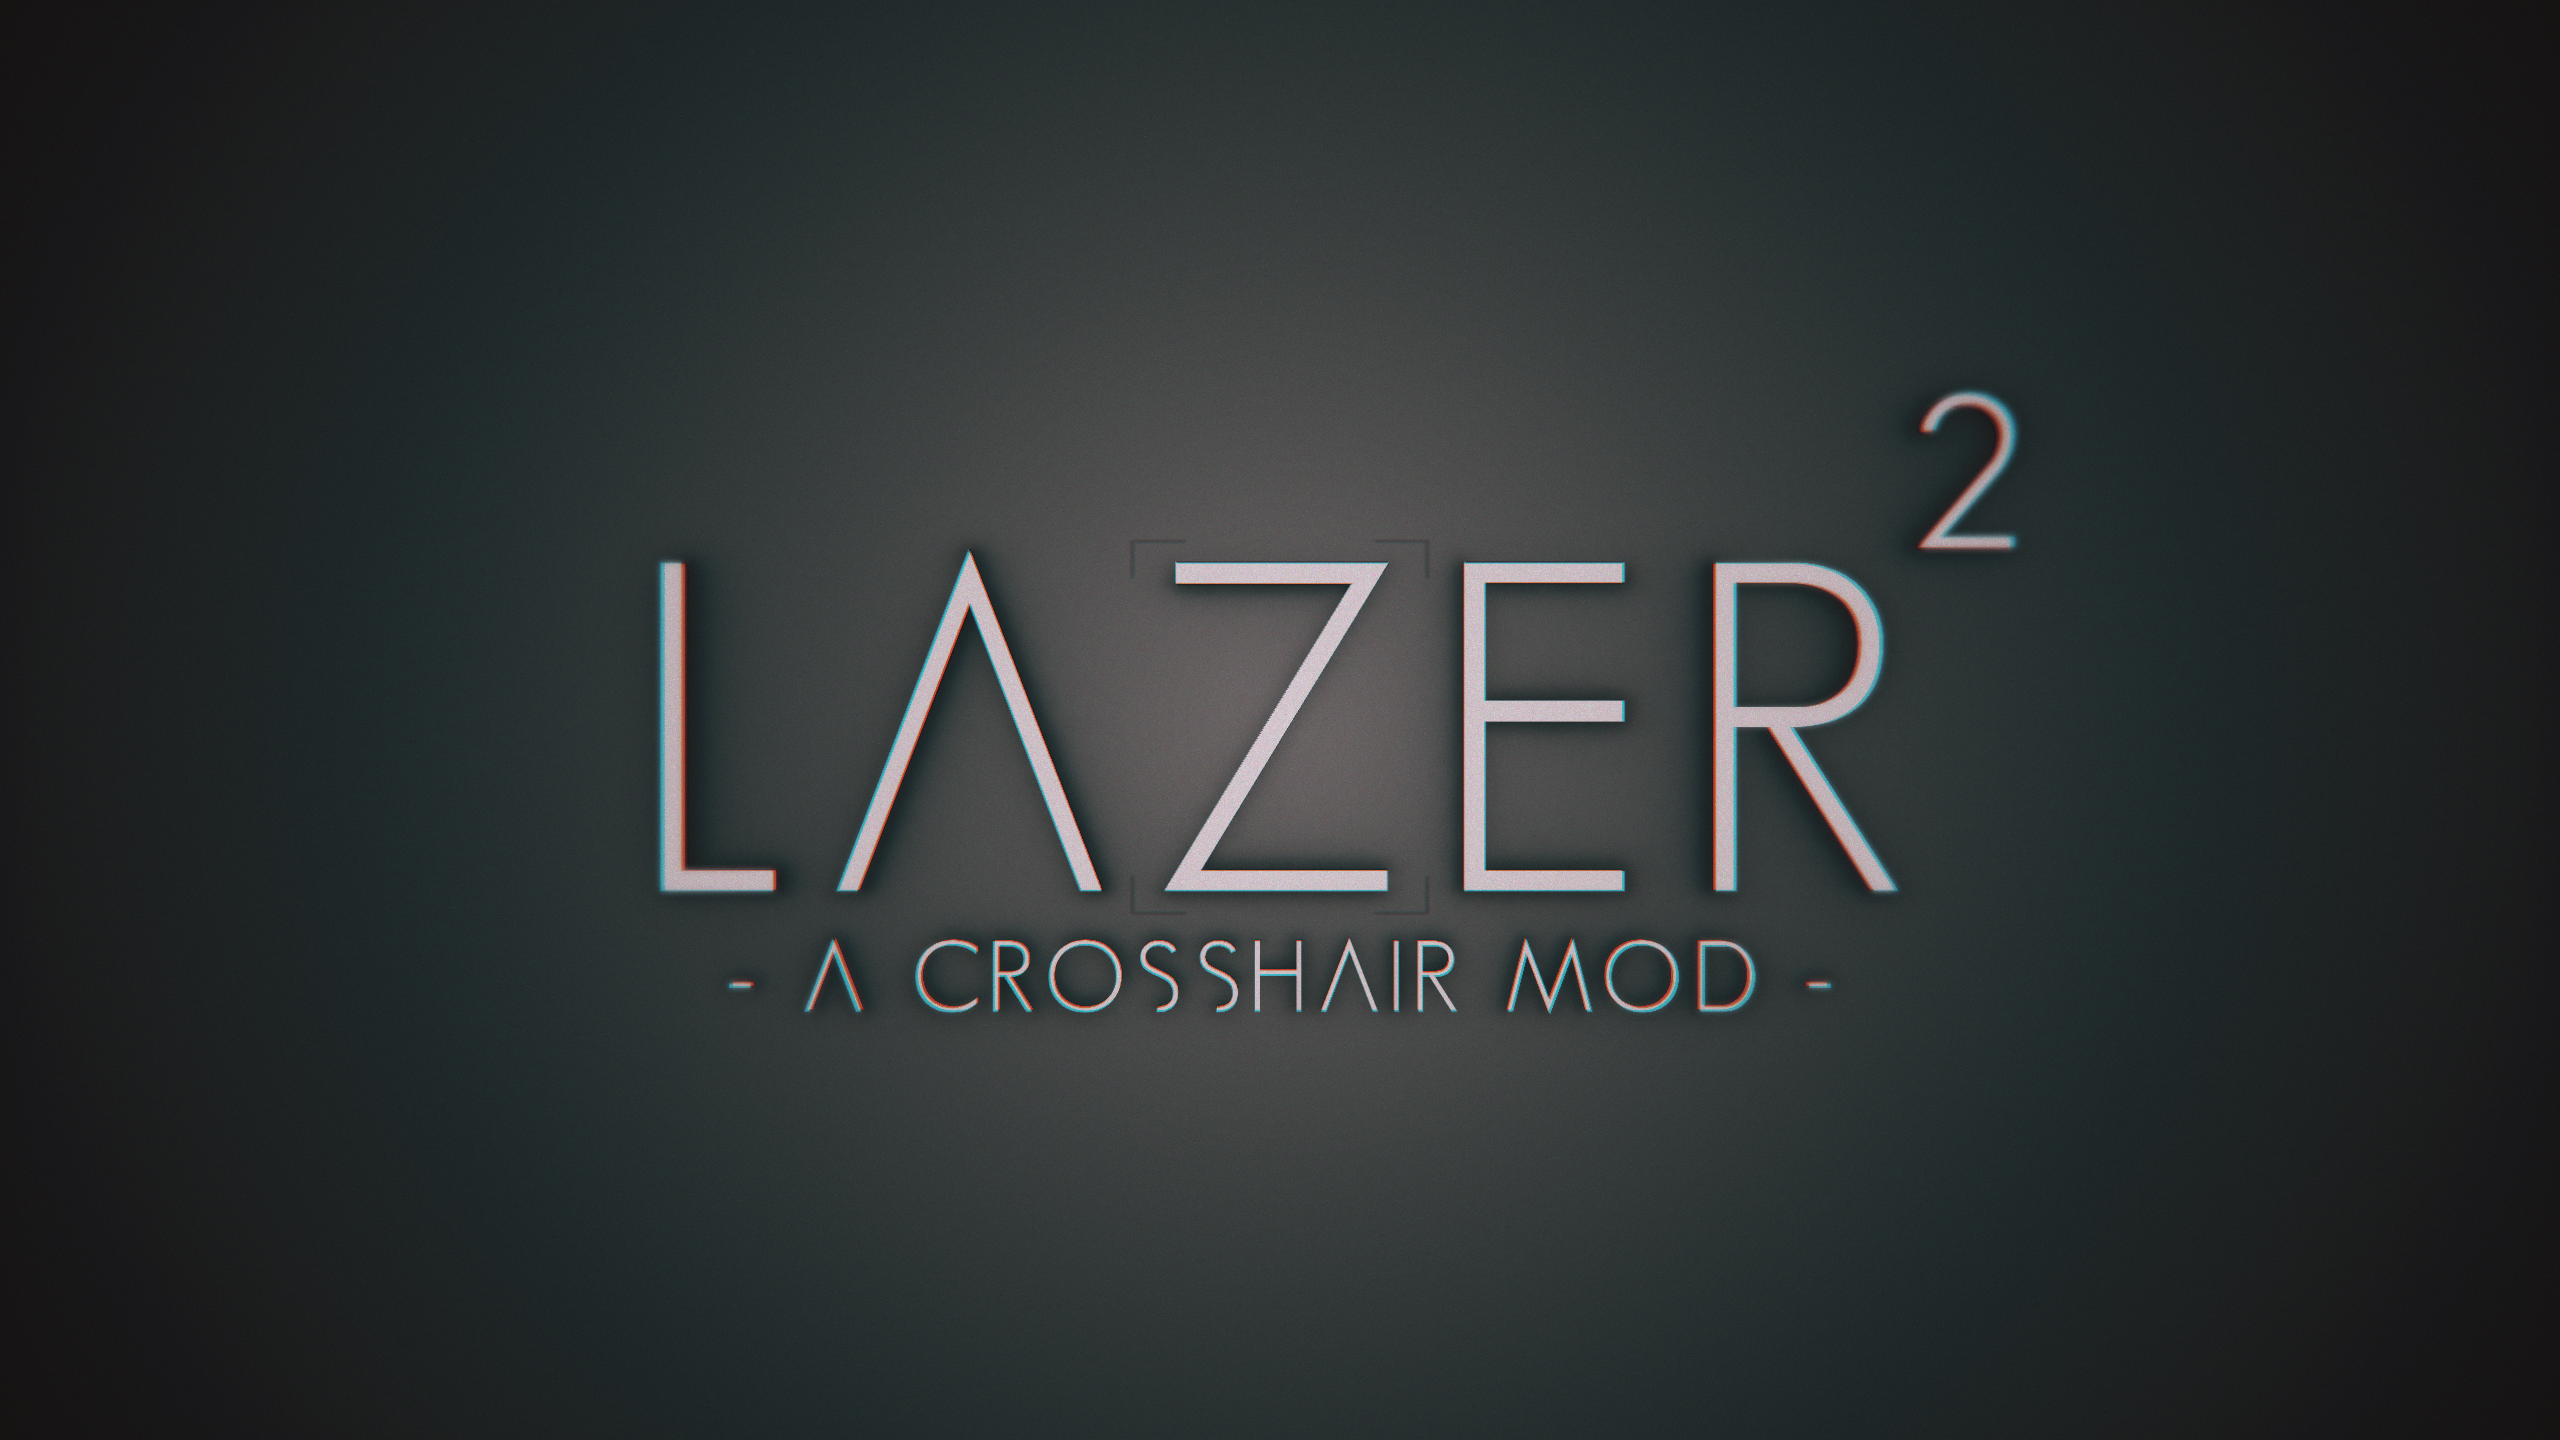 Lazer² Crosshair